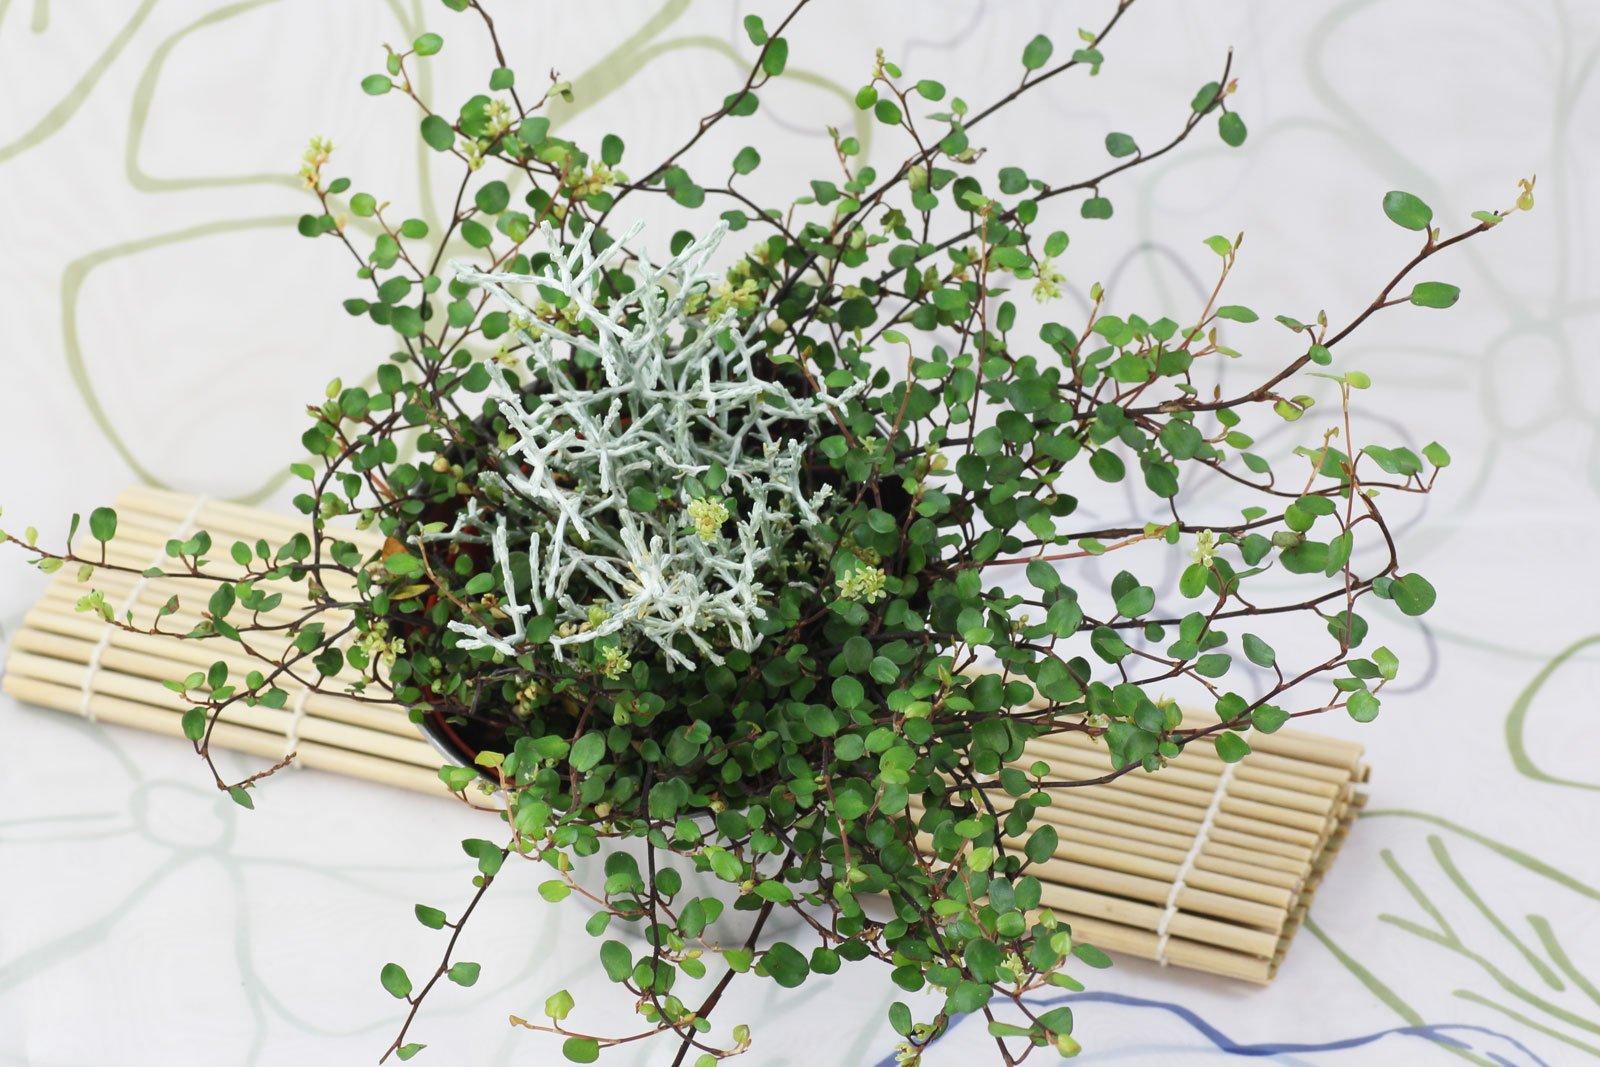 Kiwi Knoeterich Stacheldrahtpflanze